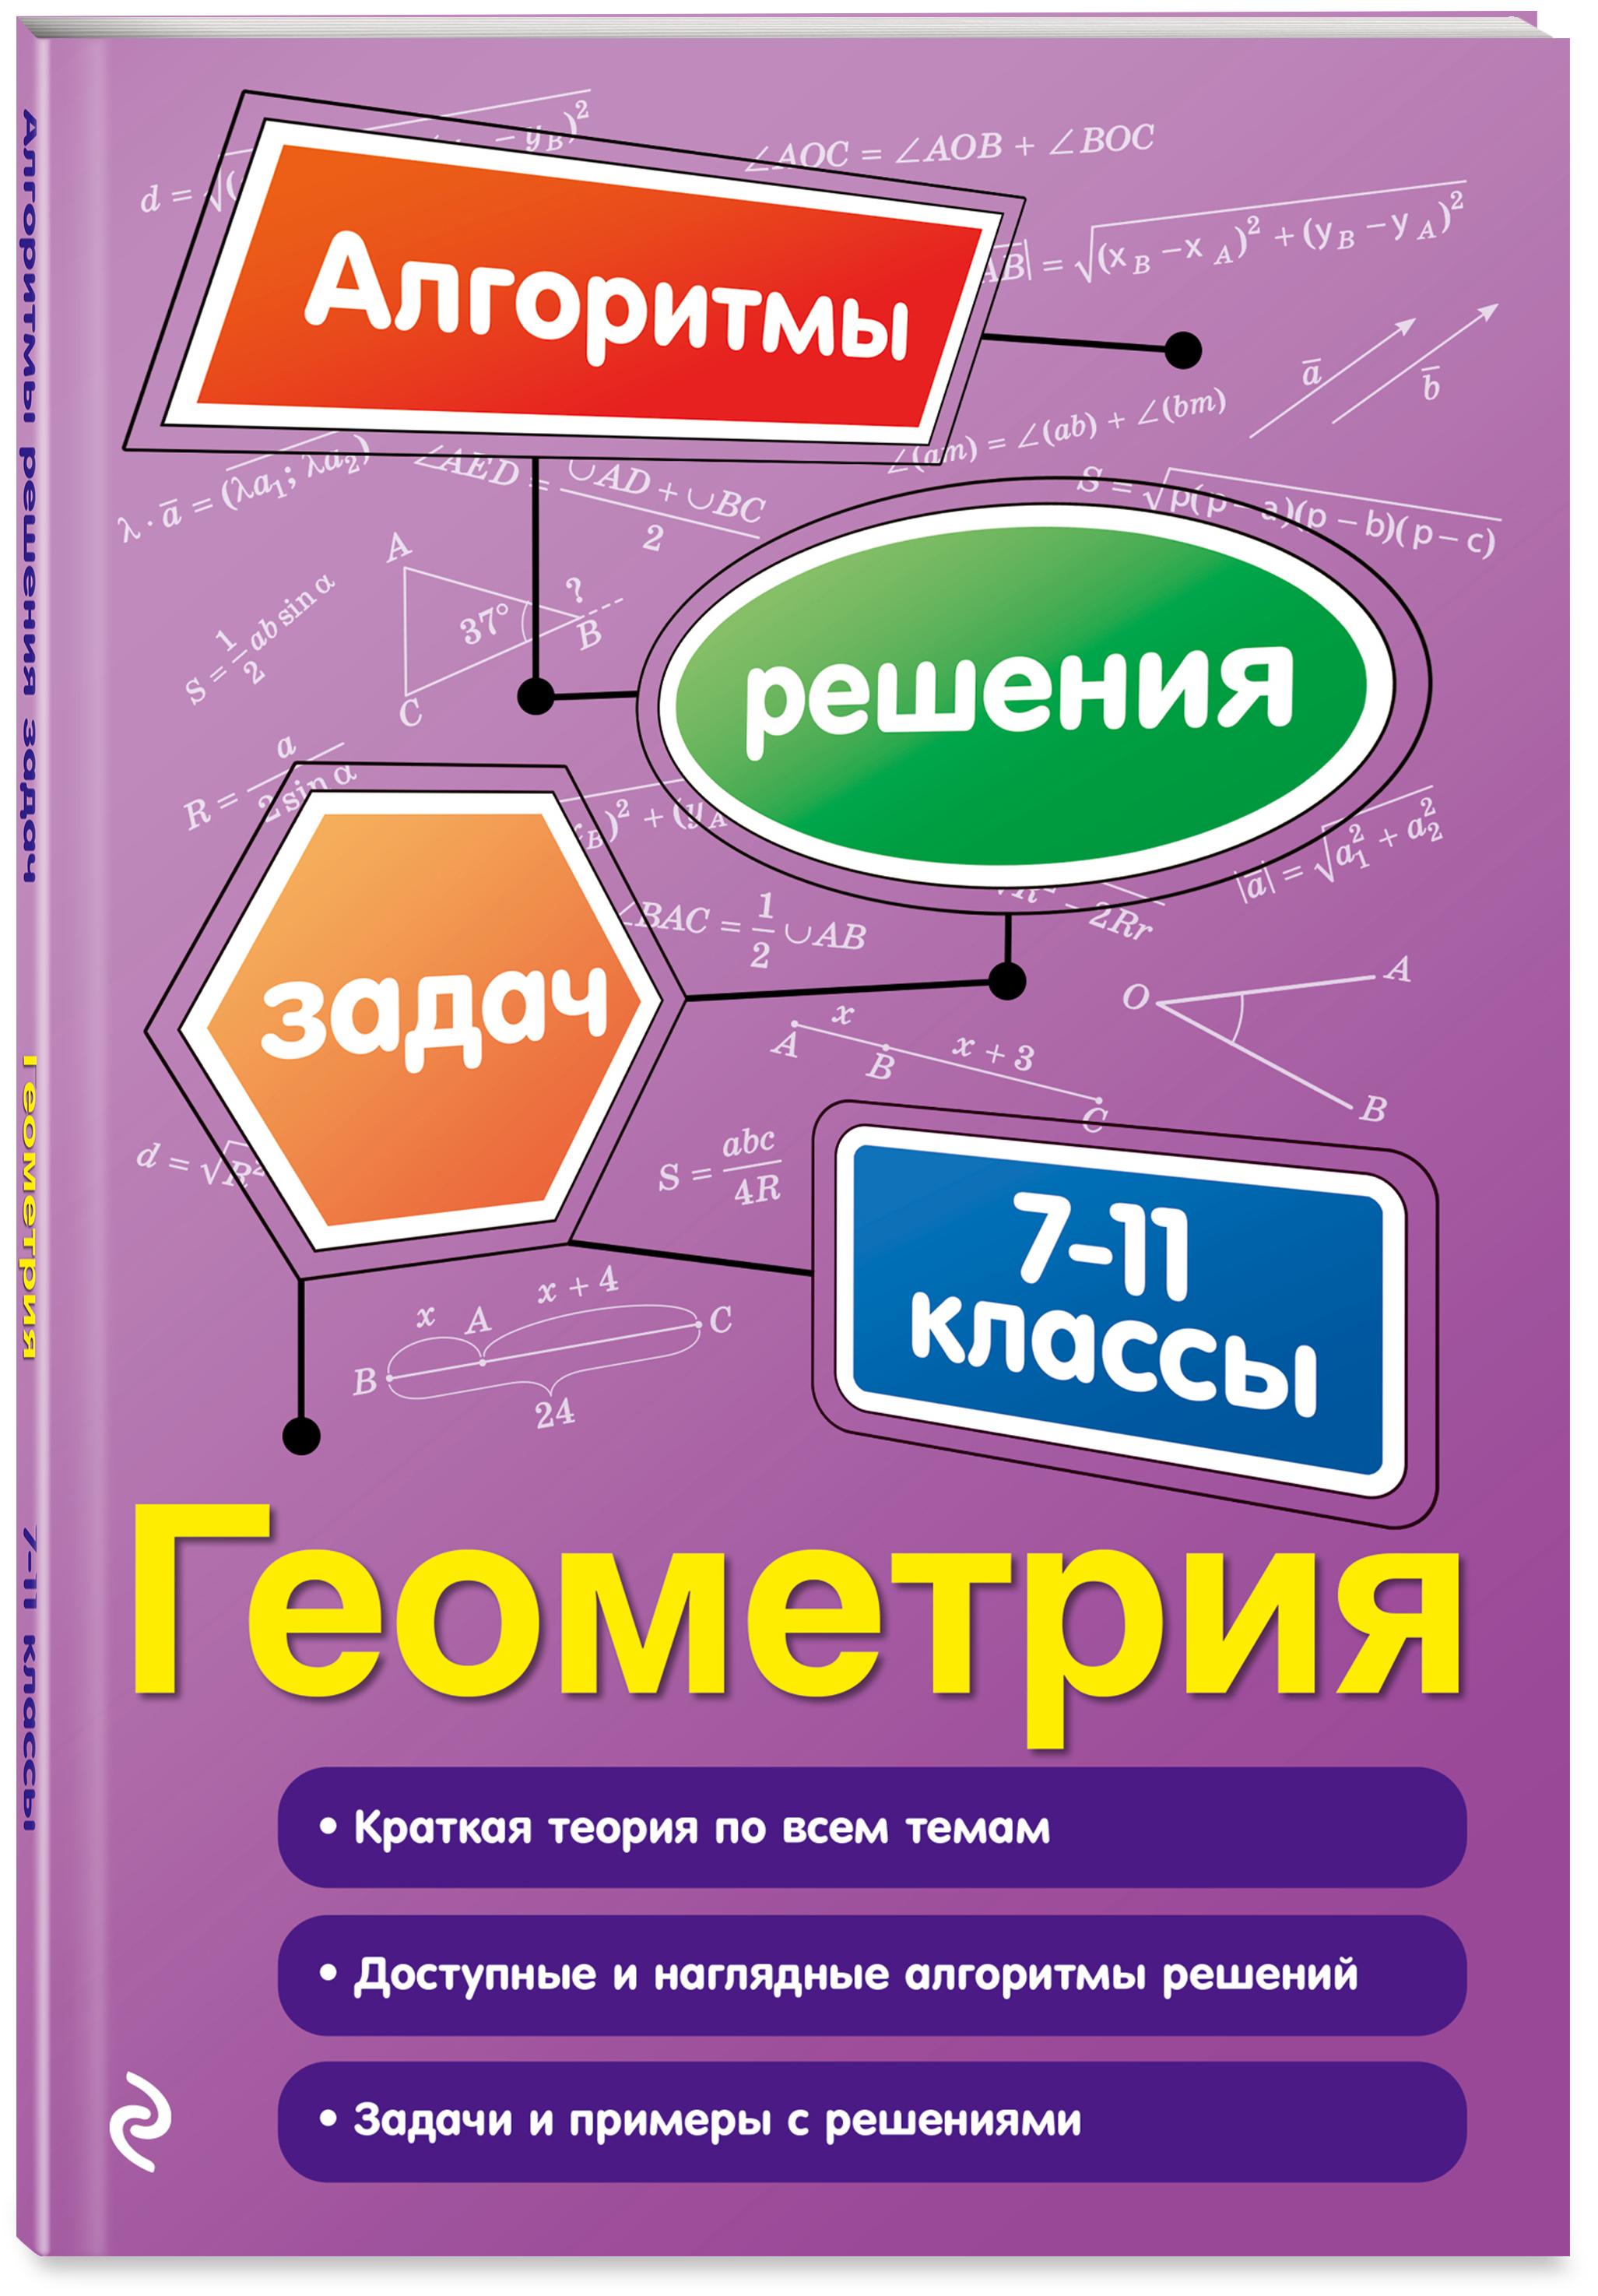 Геометрия. 7-11 классы ( Виноградова Татьяна Михайловна  )